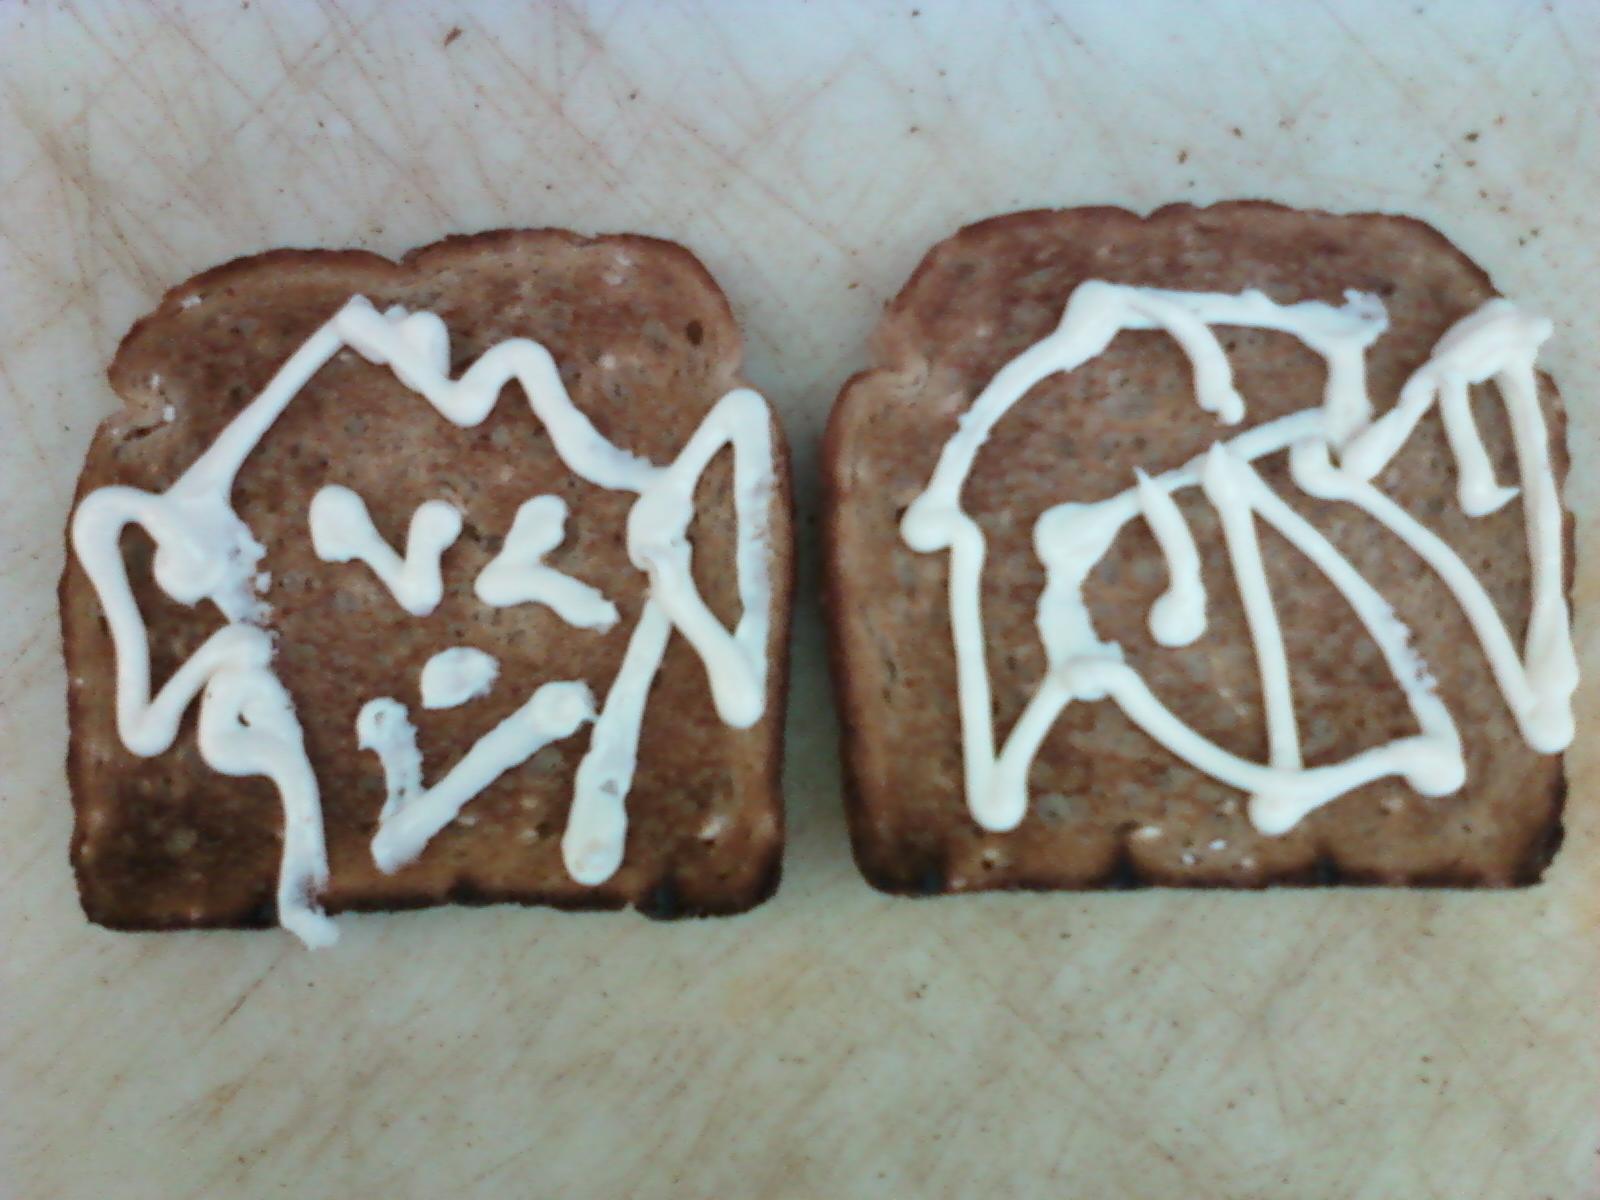 sandwich_art/0917111155.jpg